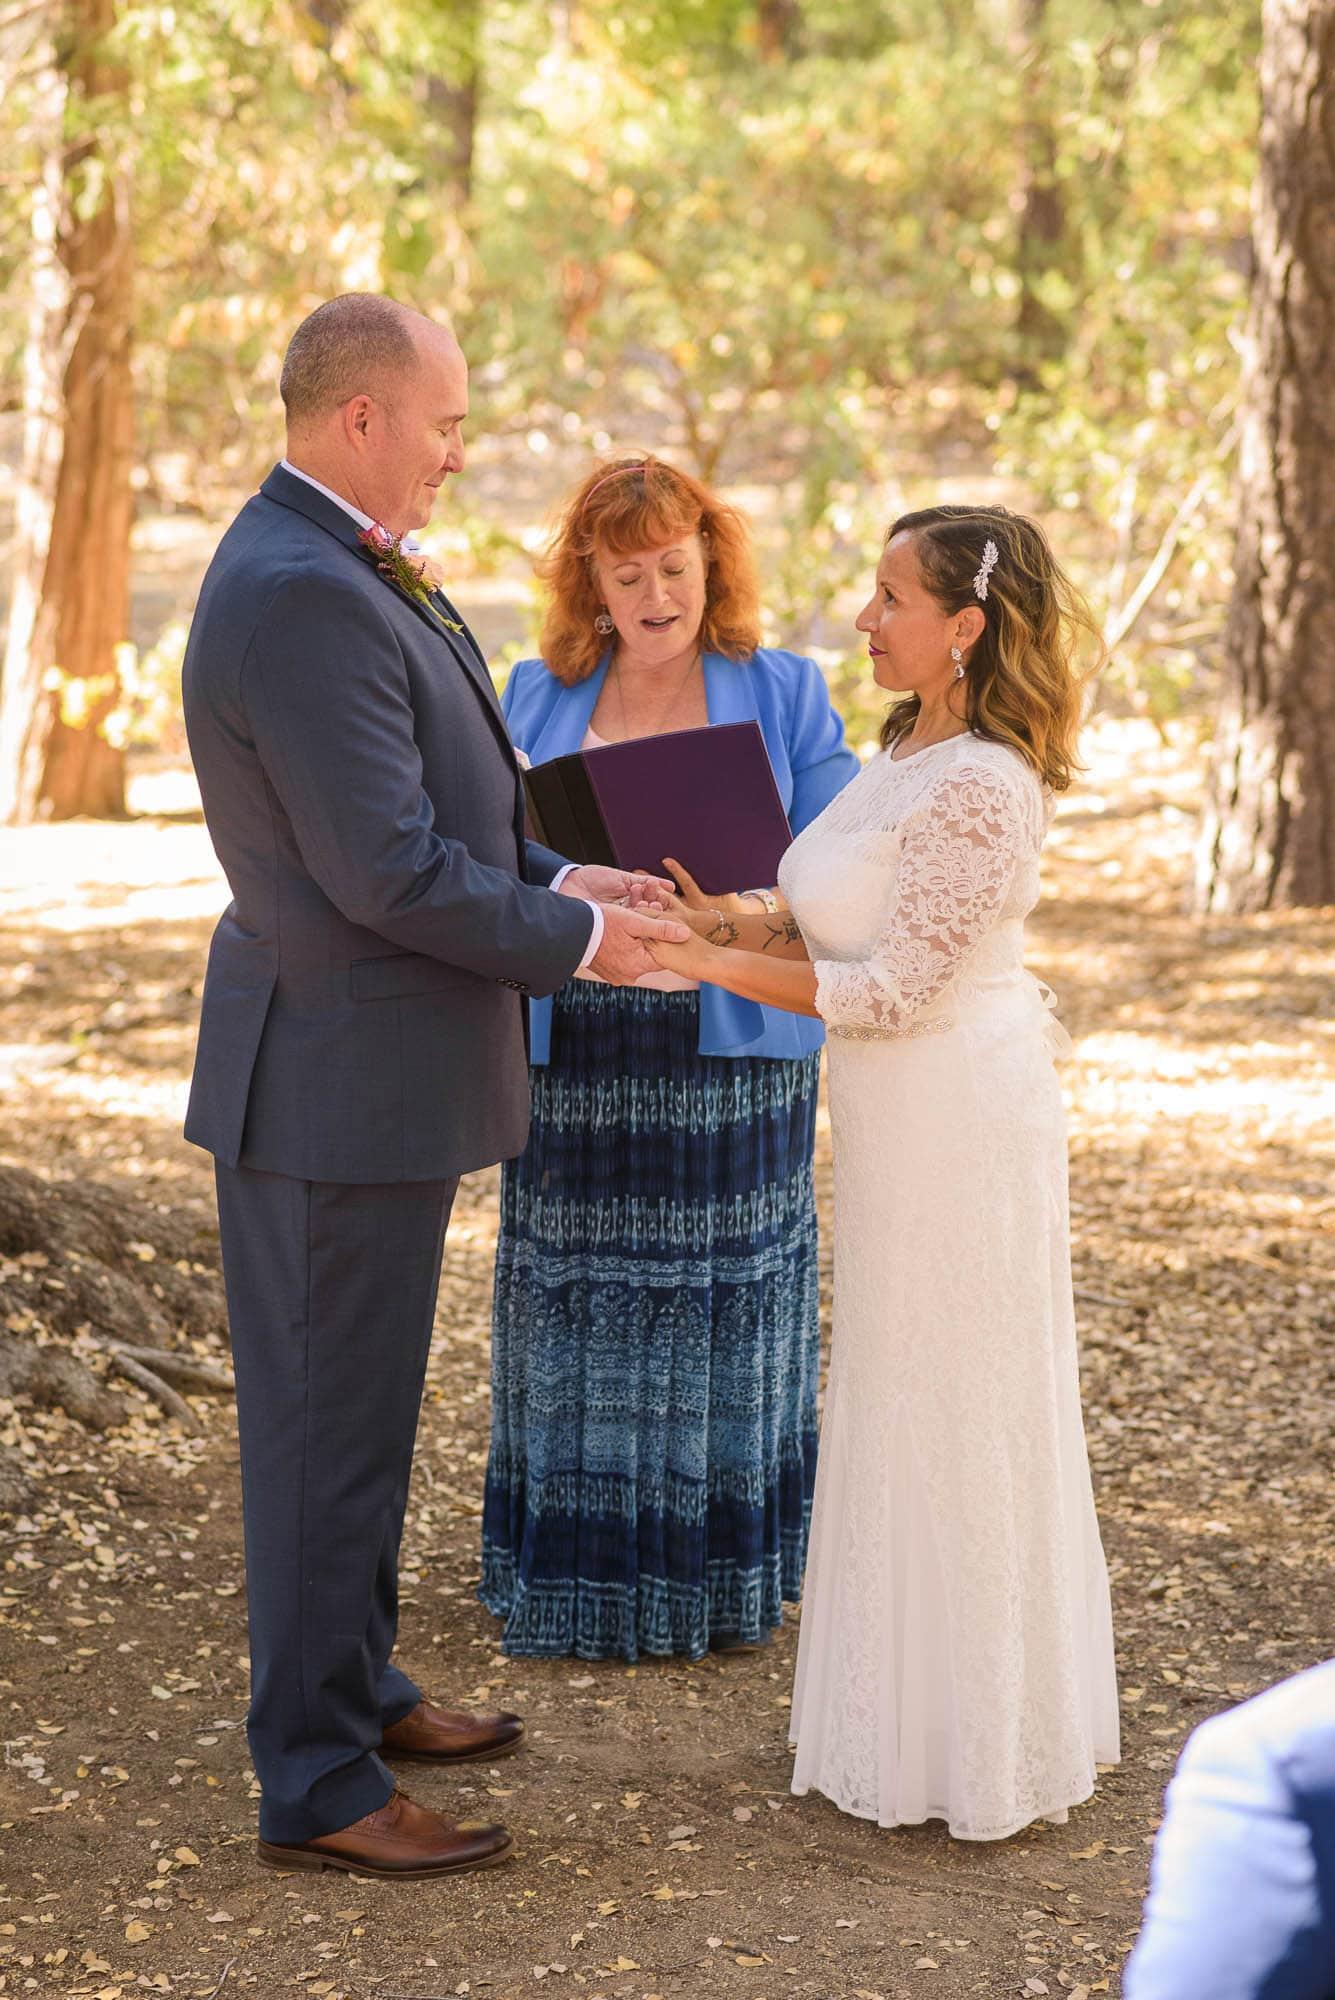 020_Alan_and_Heidi_Wedding_Jackie_Dannon